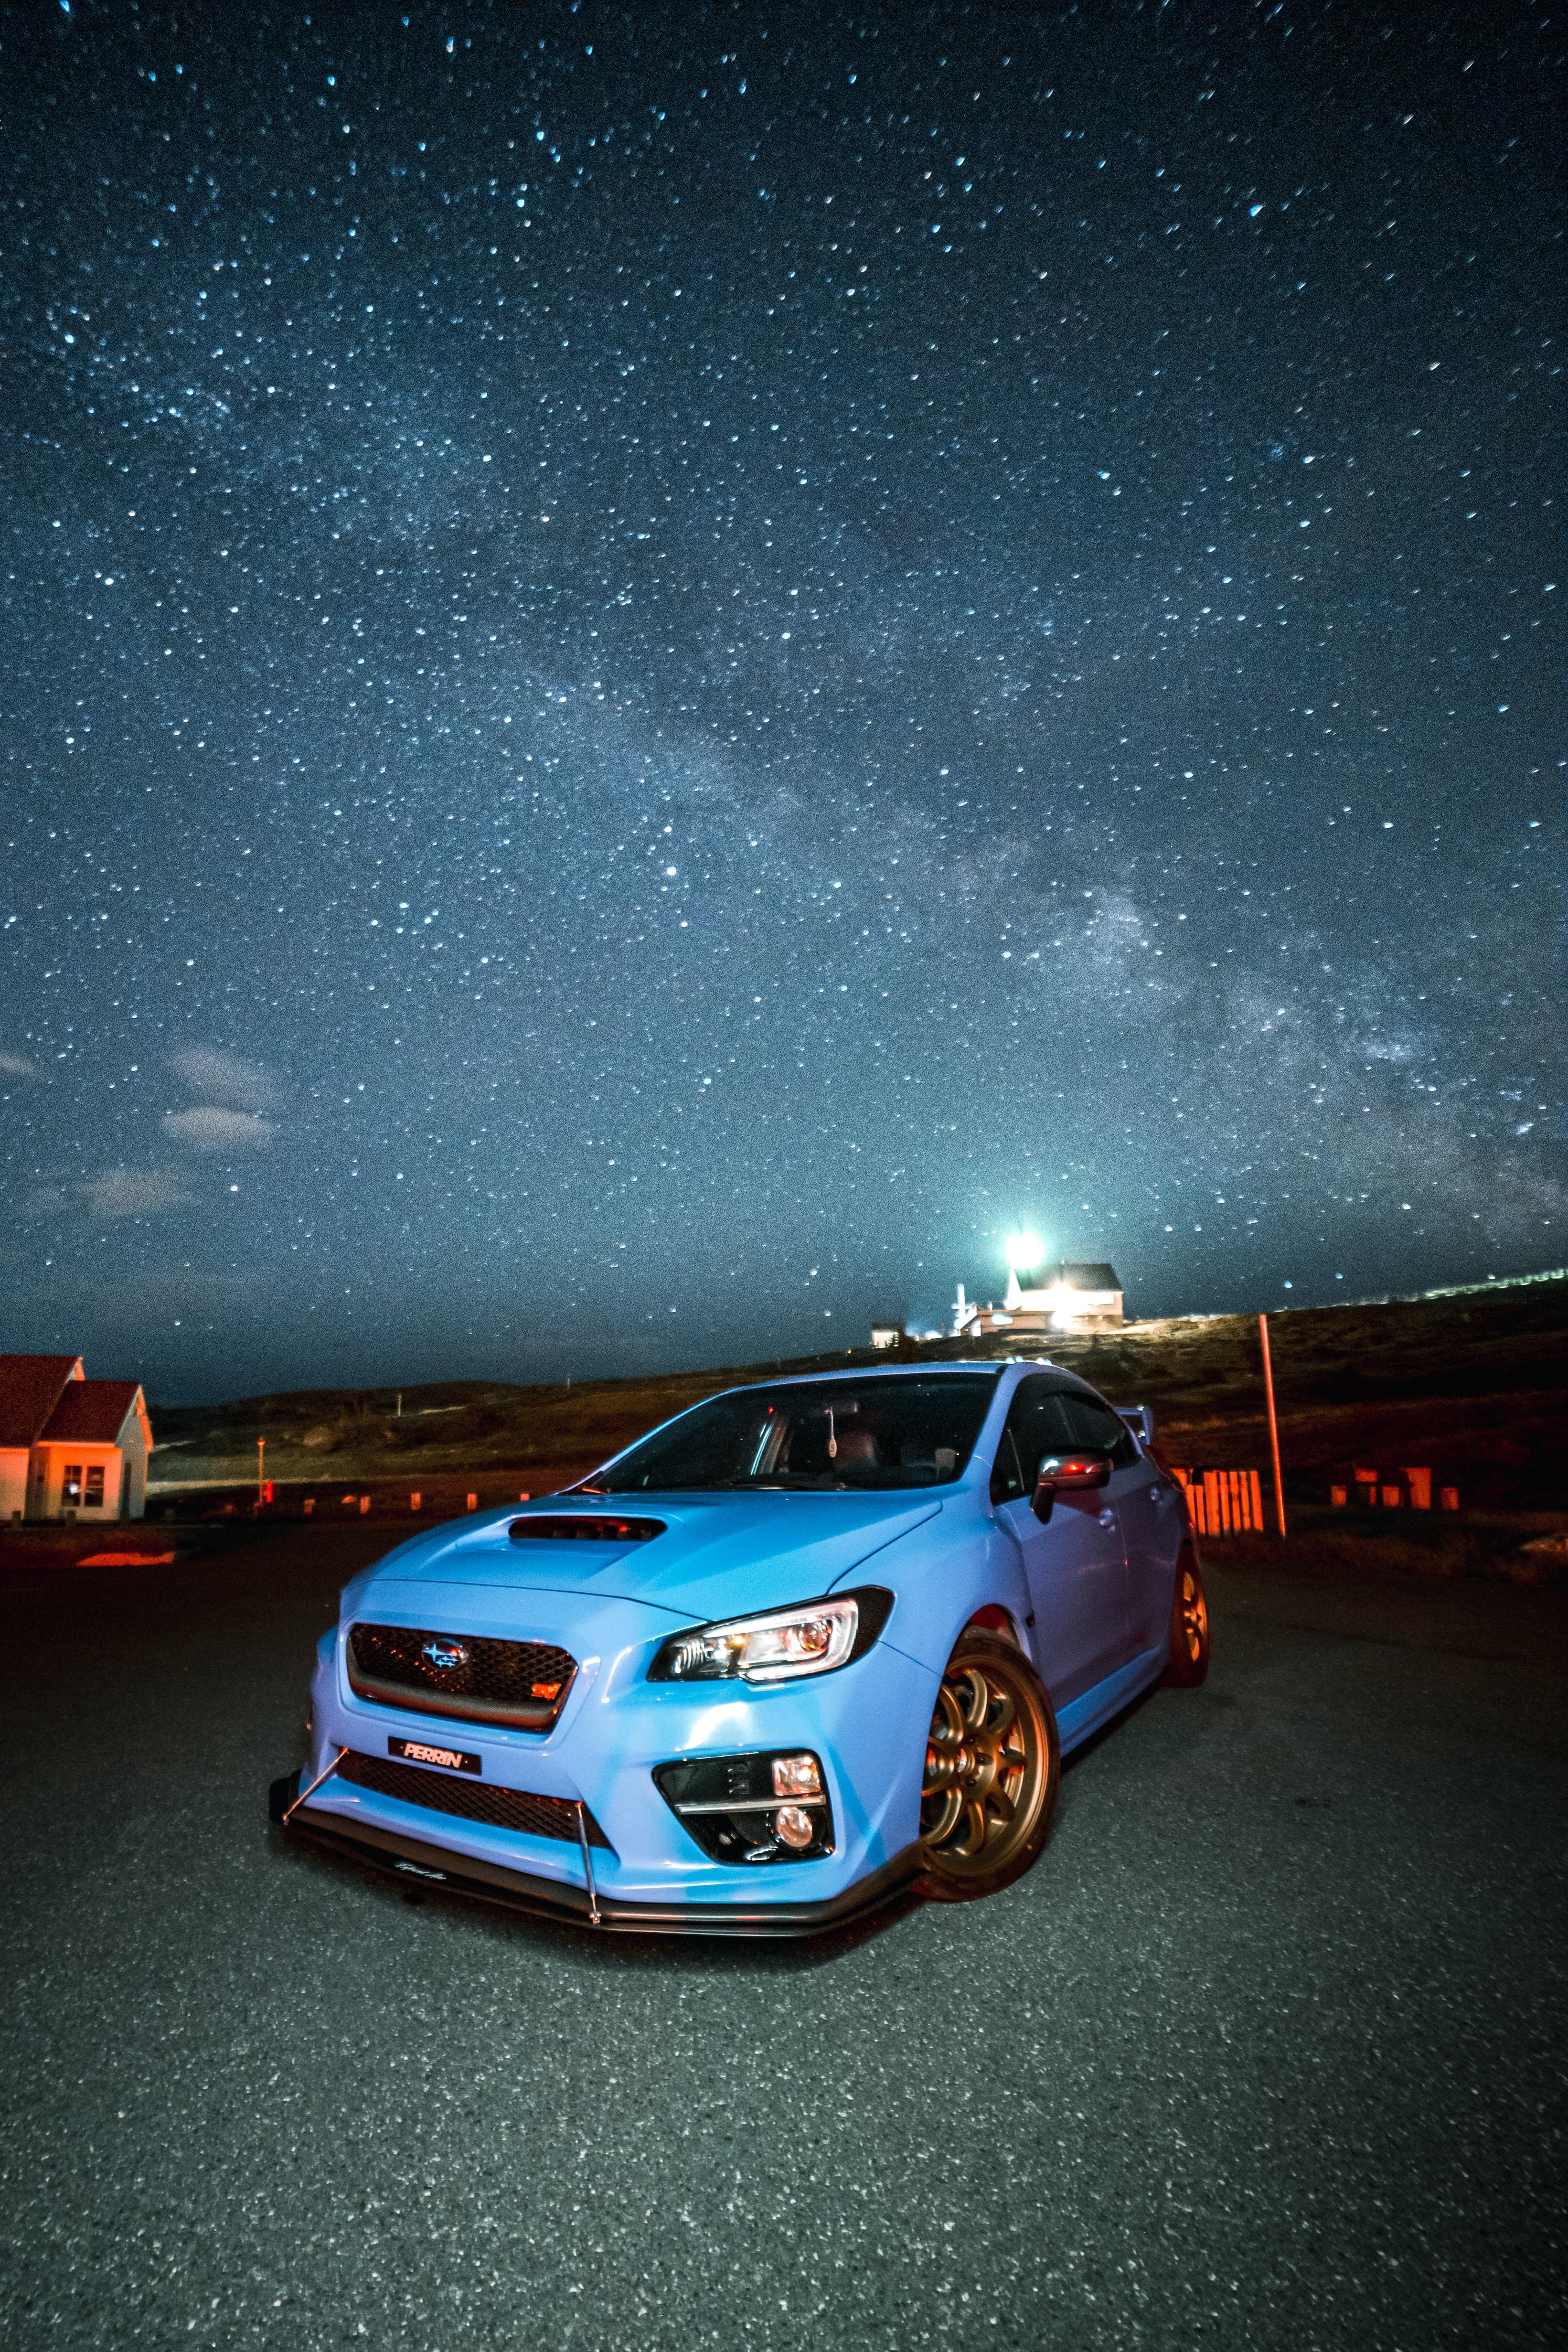 128940 Screensavers and Wallpapers Subaru for phone. Download Sports, Subaru, Cars, Car, Front View, Sports Car, Spoiler, Subaru Wrx pictures for free